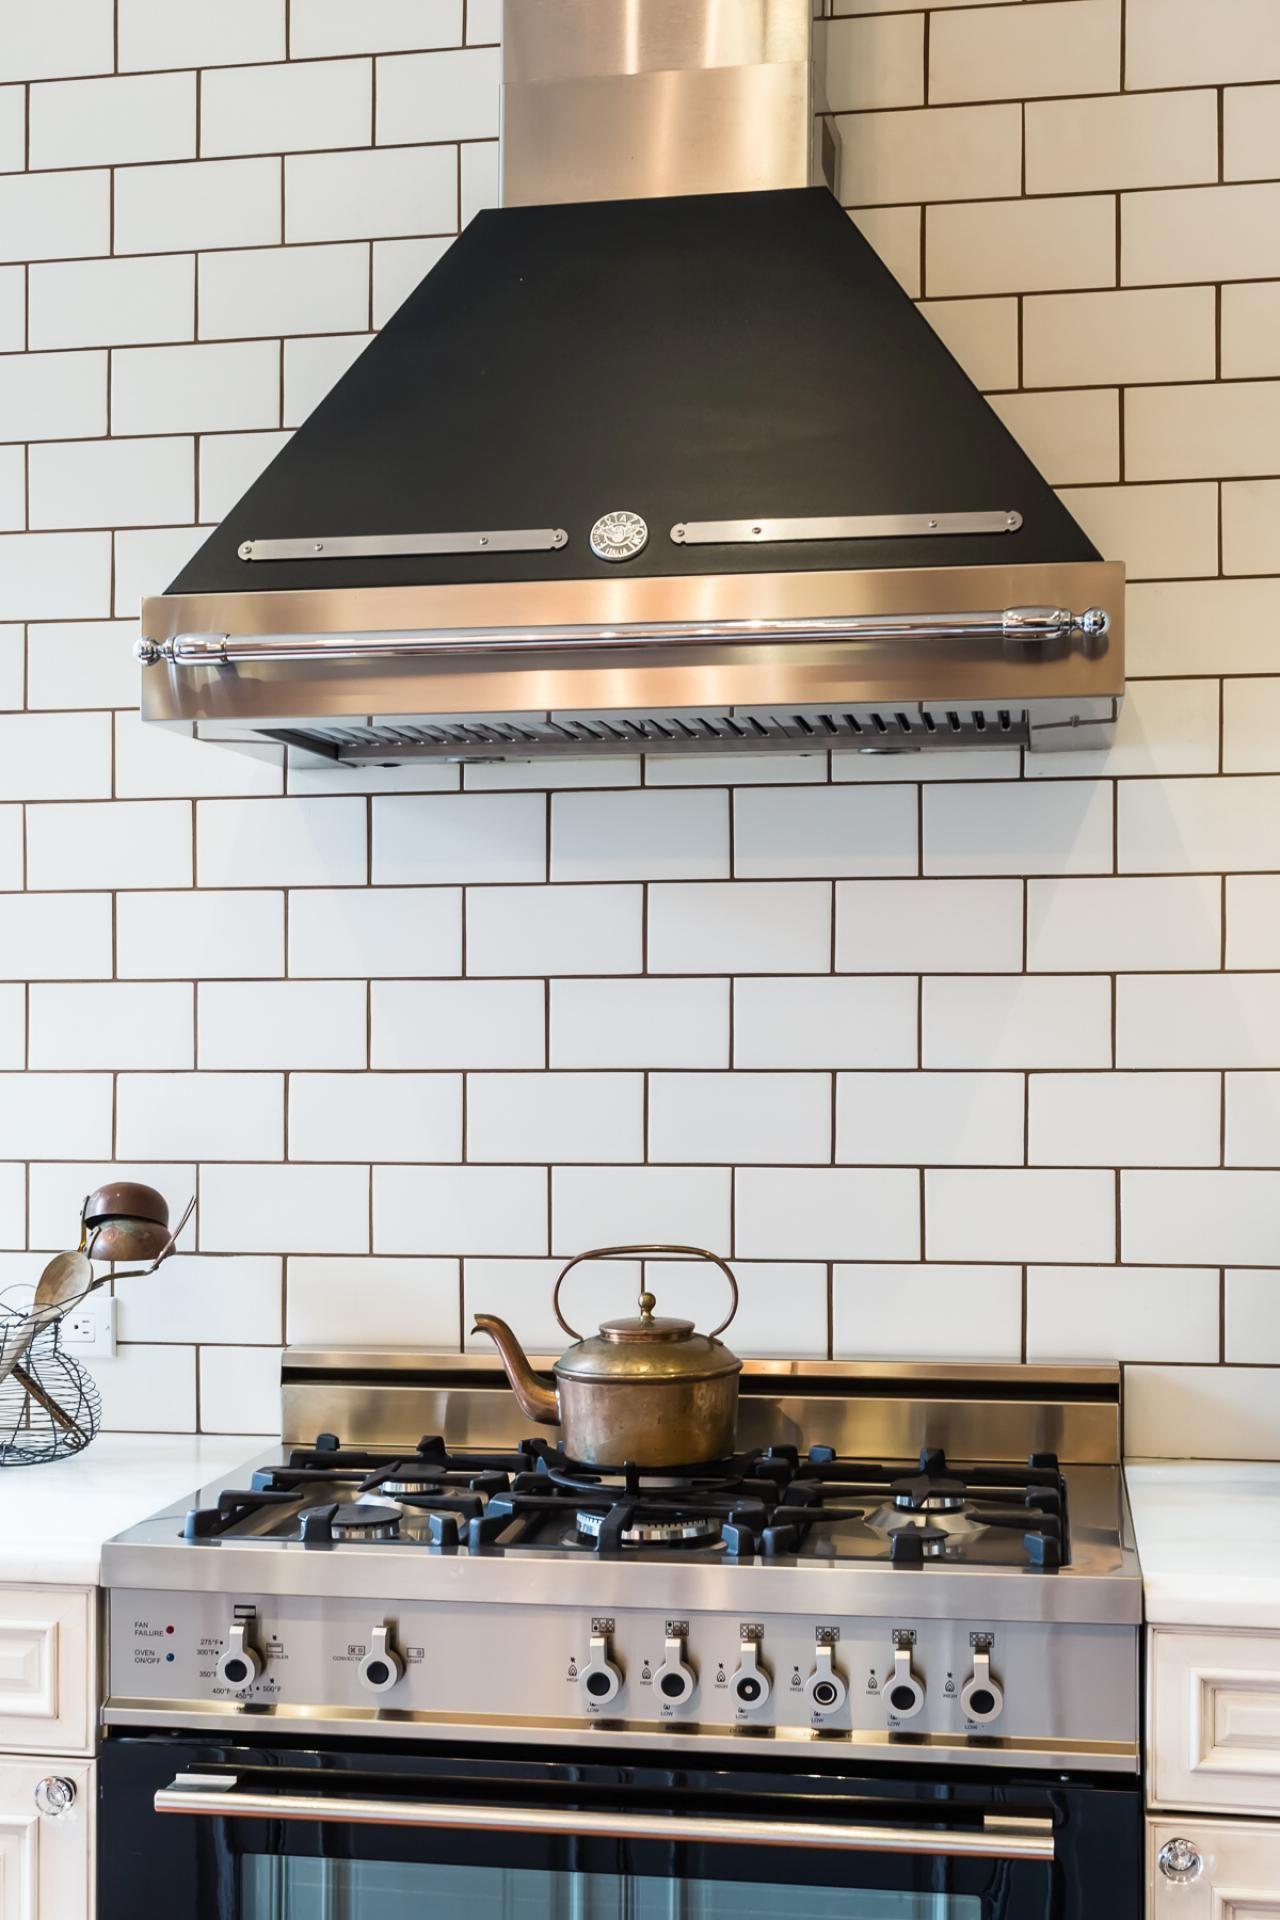 Splendid white kitchen backsplash with gray grout photos hgtv